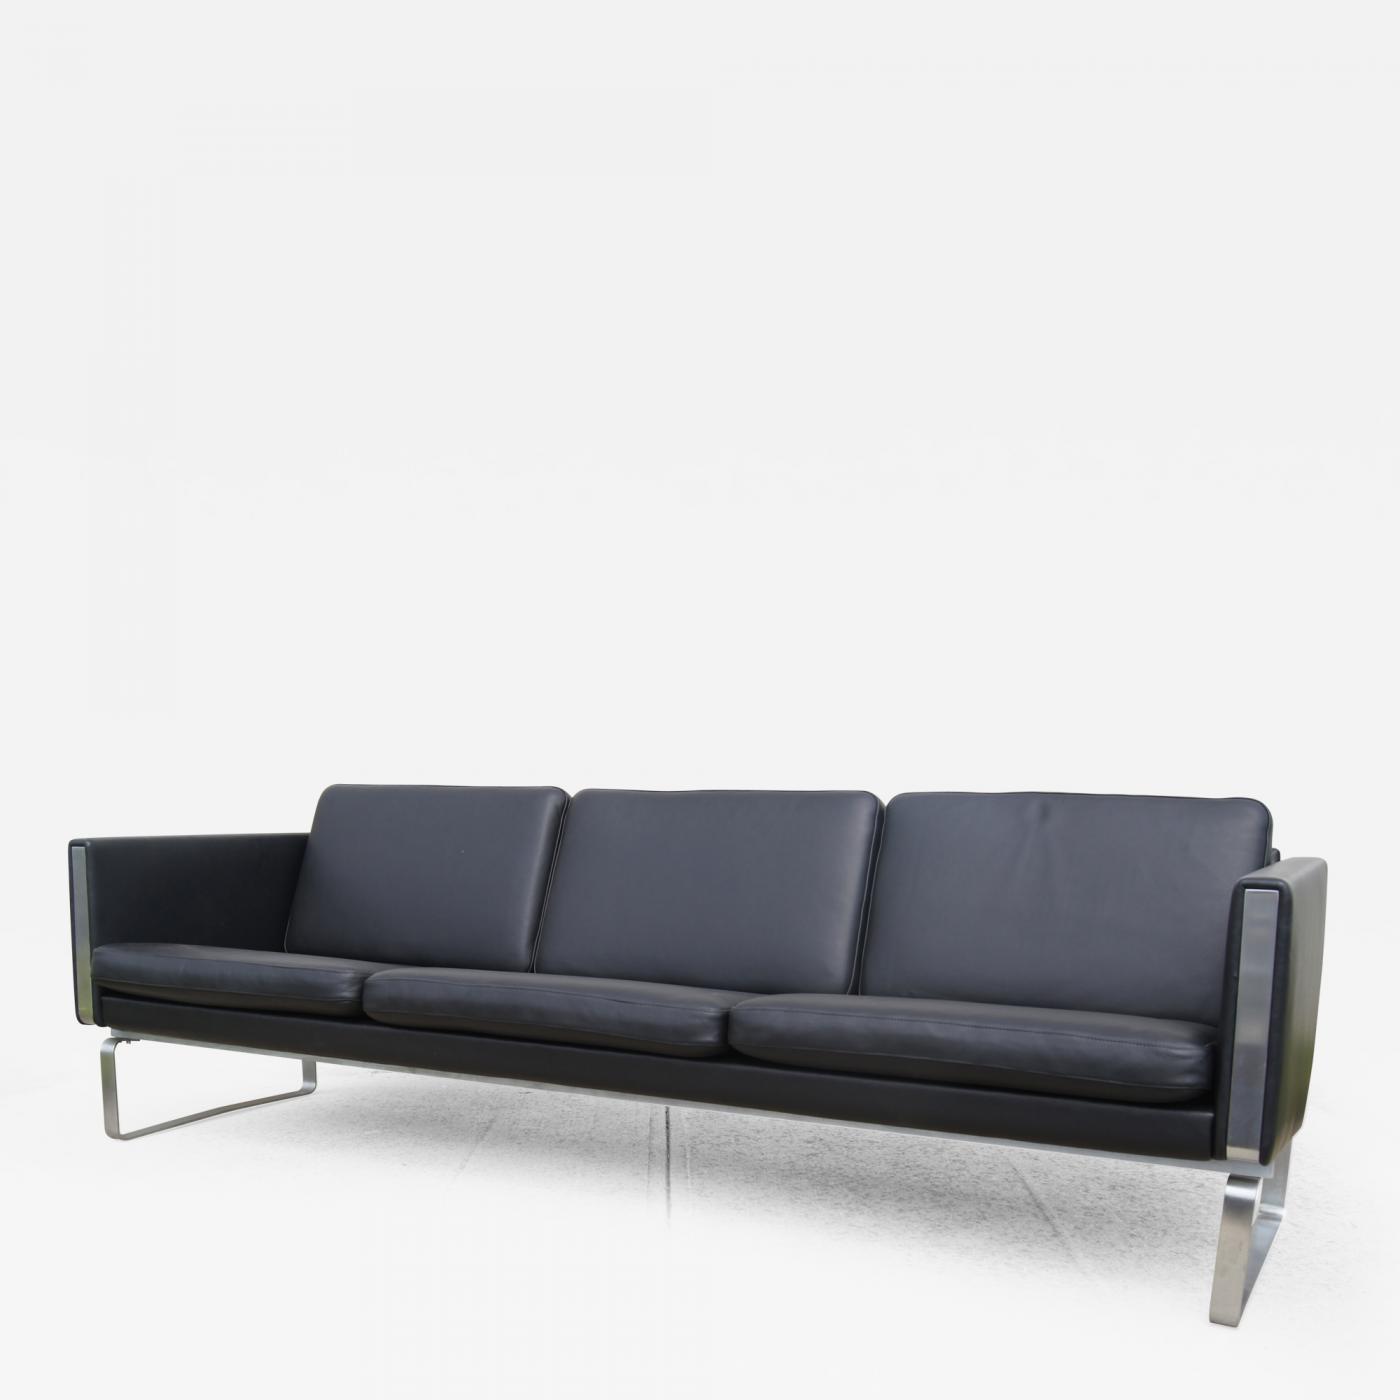 Hans J Wegner CH103 Leather Sofa by Hans Wegner for Carl Hansen